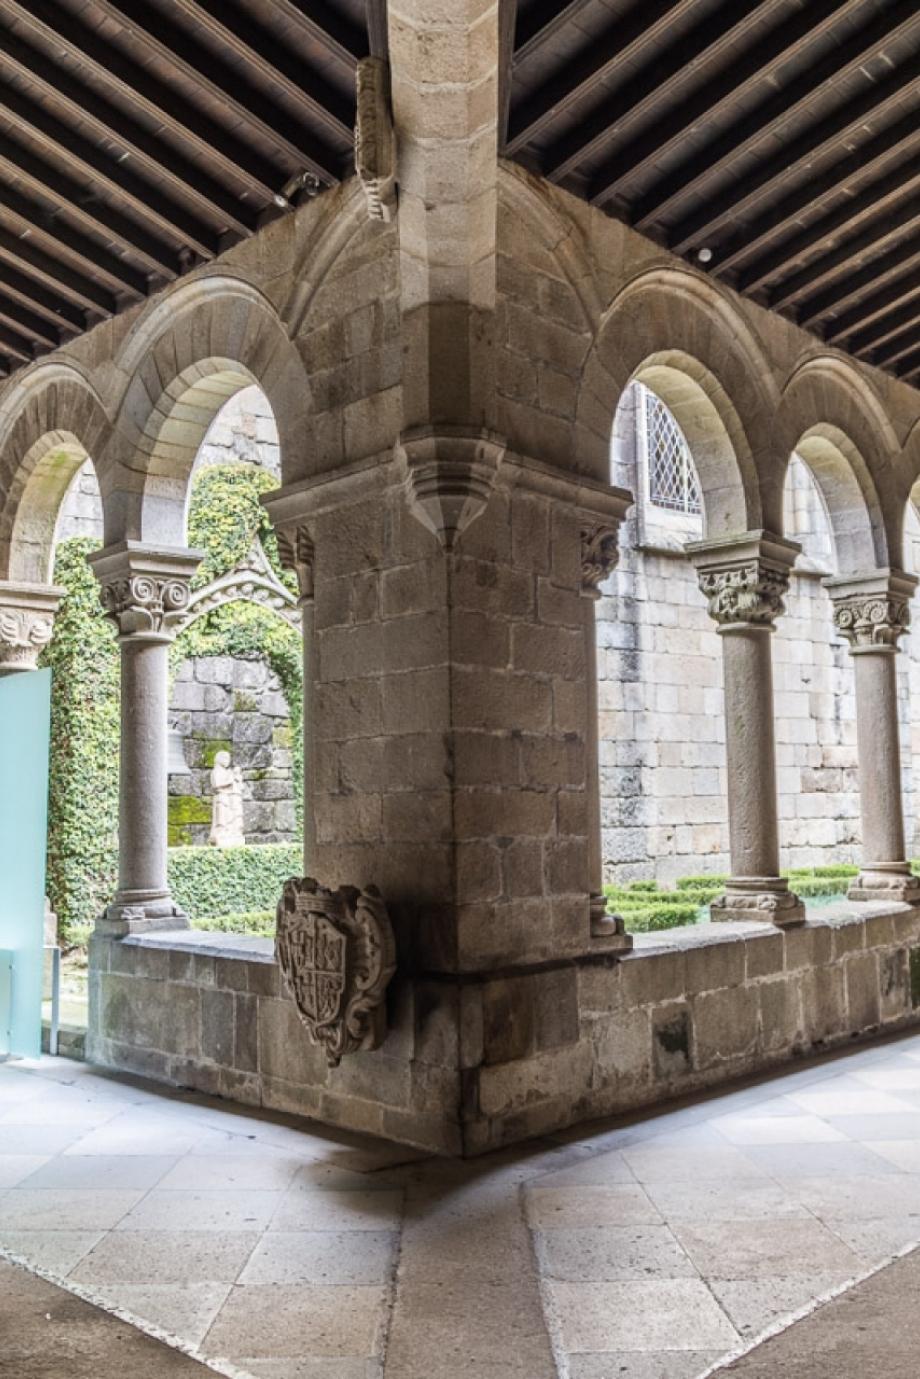 GuimaraesCool_Blog_Atividades Gratuitas no Museu Alberto Sampaio